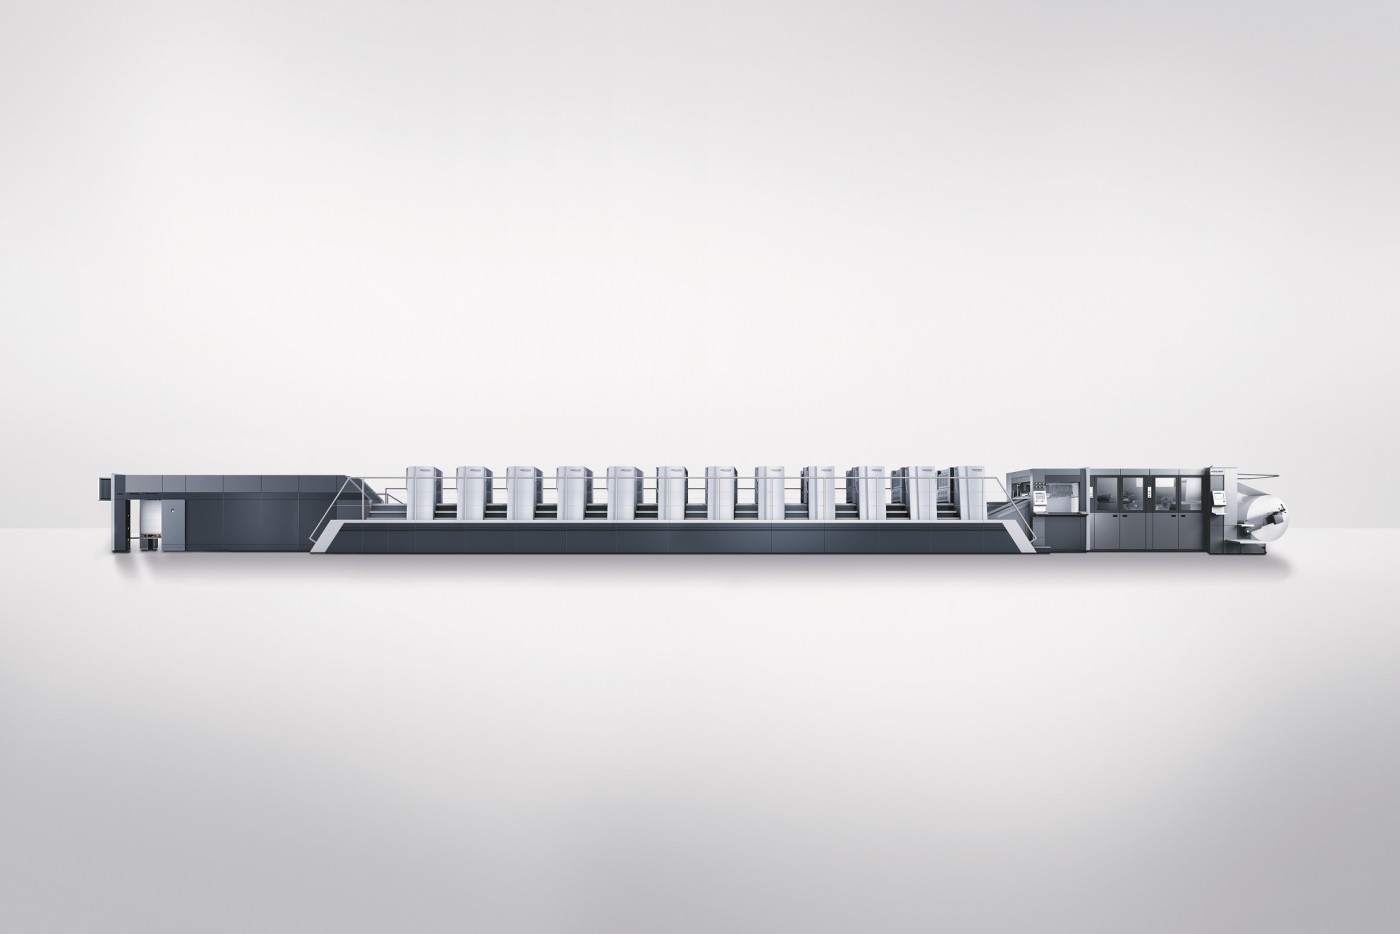 Heidelberg-Speedmaster-XL-106-8P-LYYLX4-con-CutStar